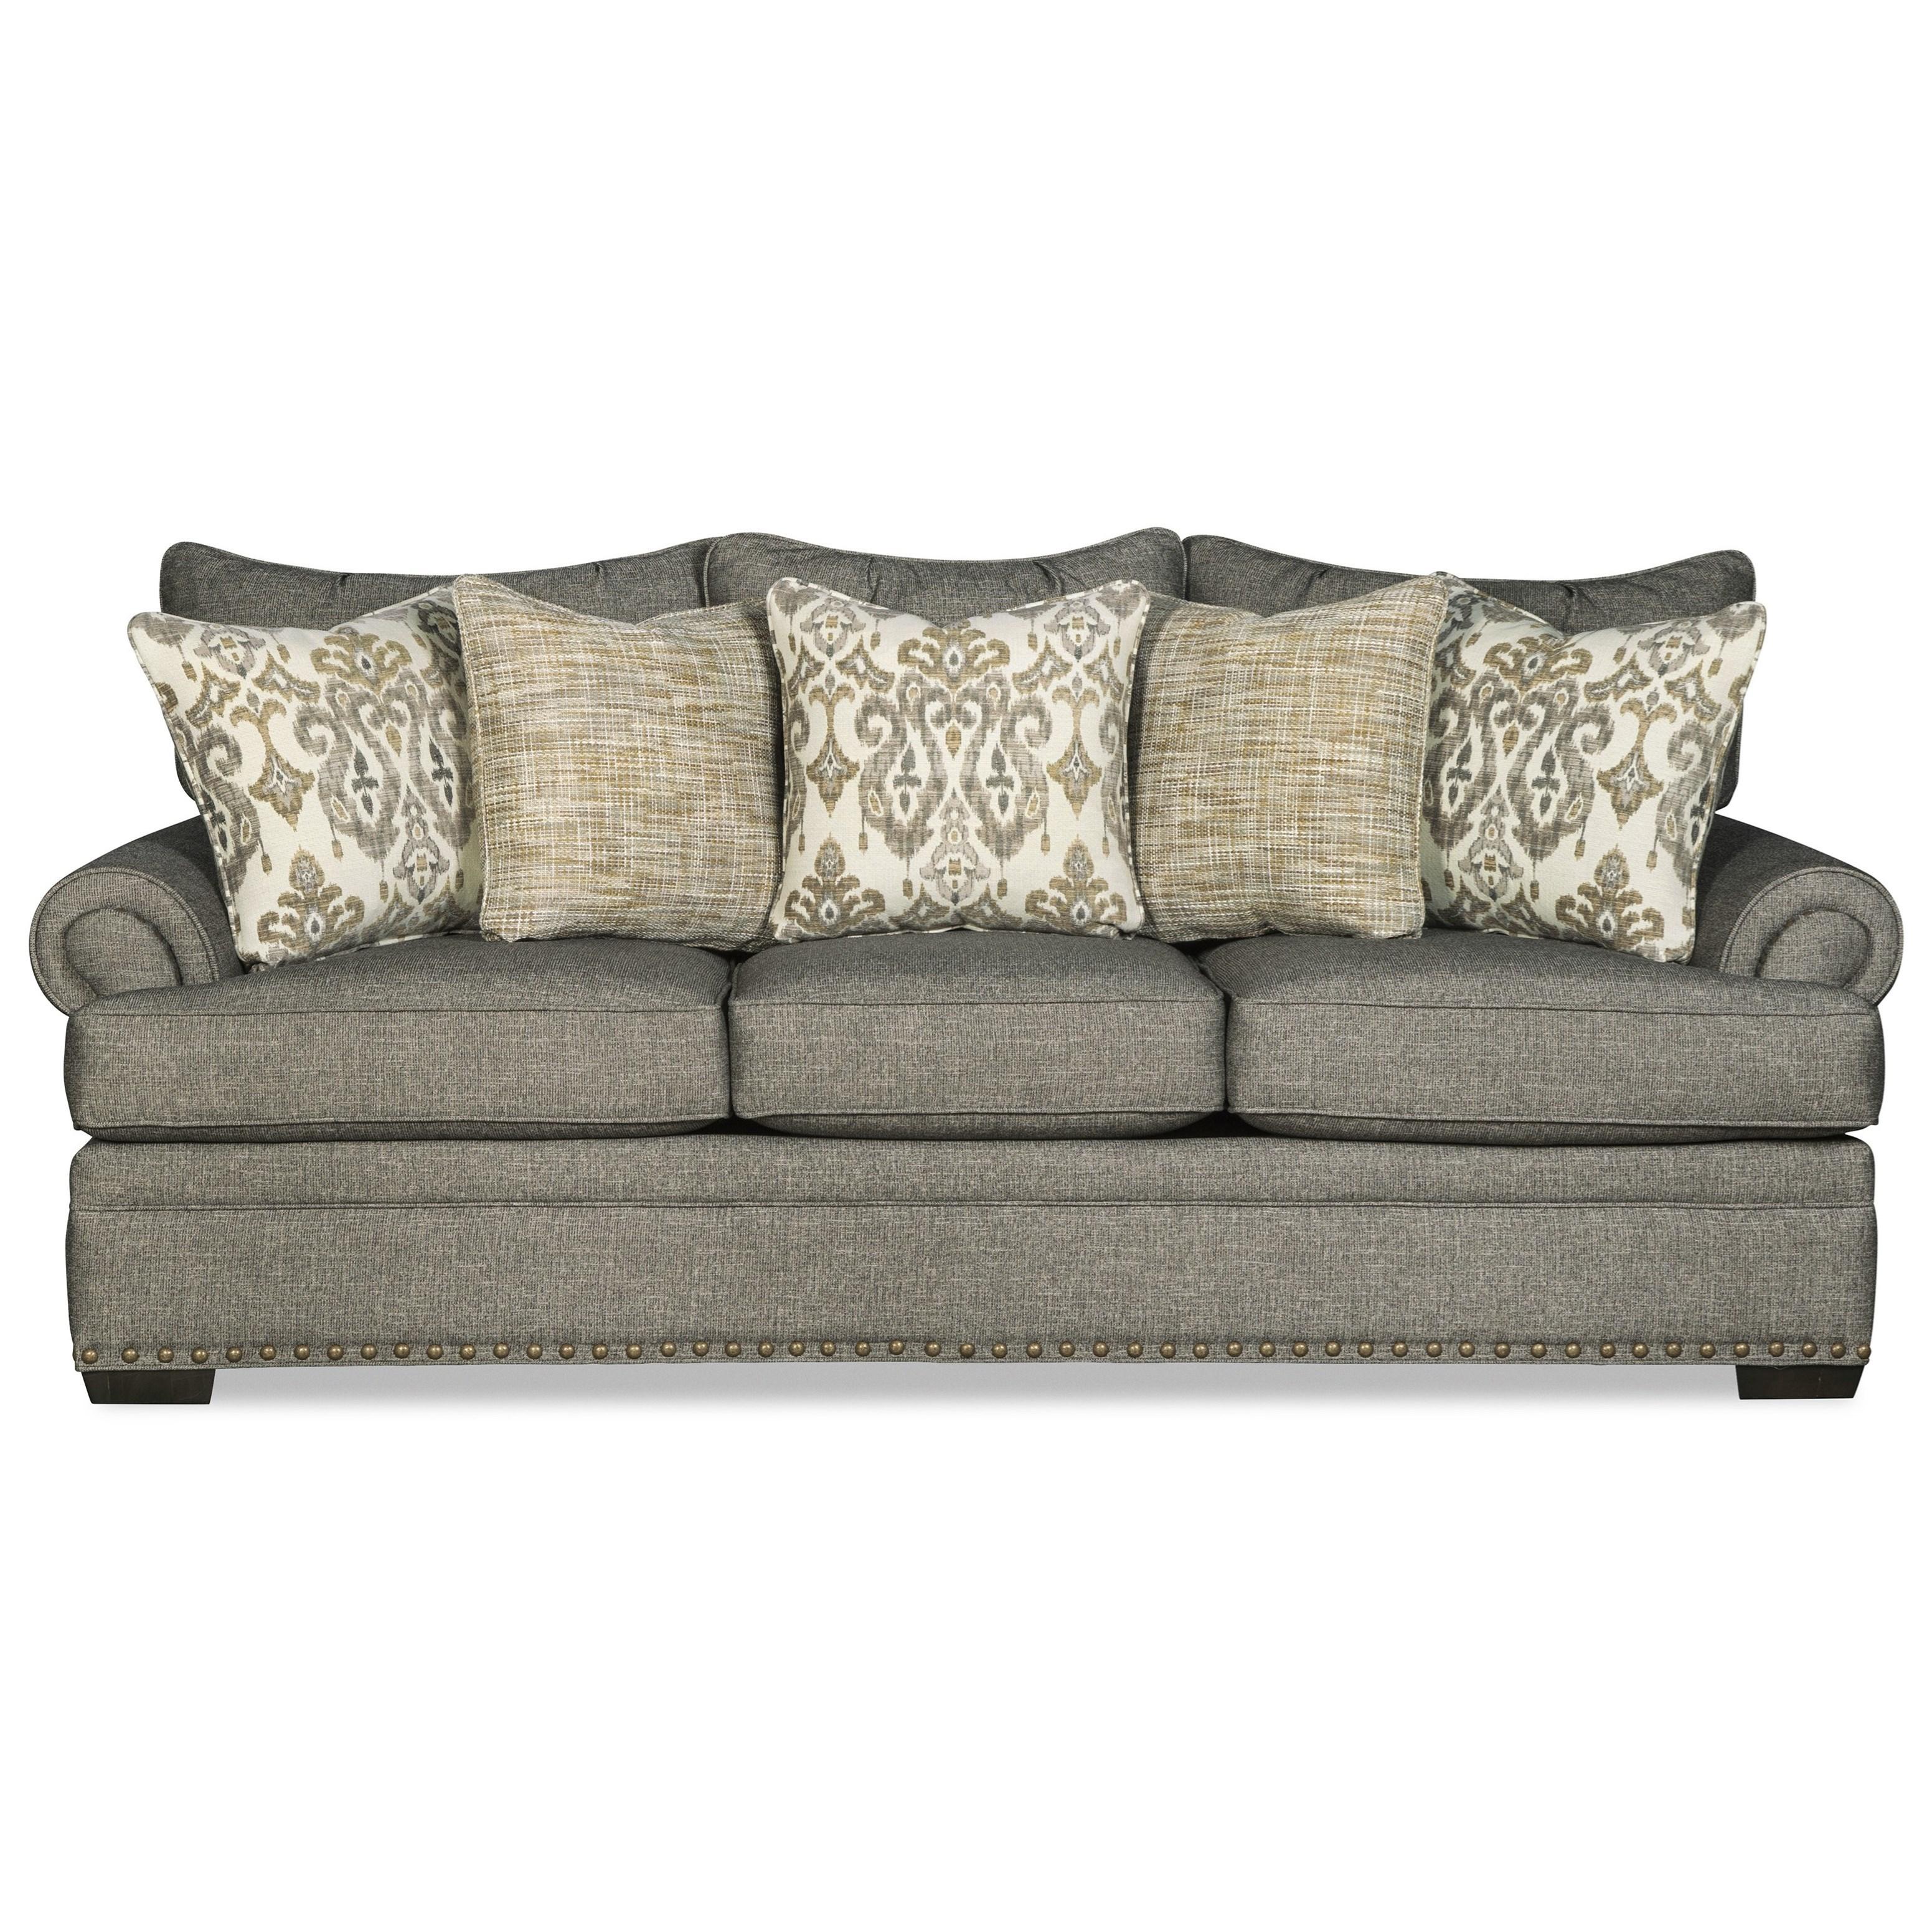 701650 Sofa by Hickorycraft at Johnny Janosik